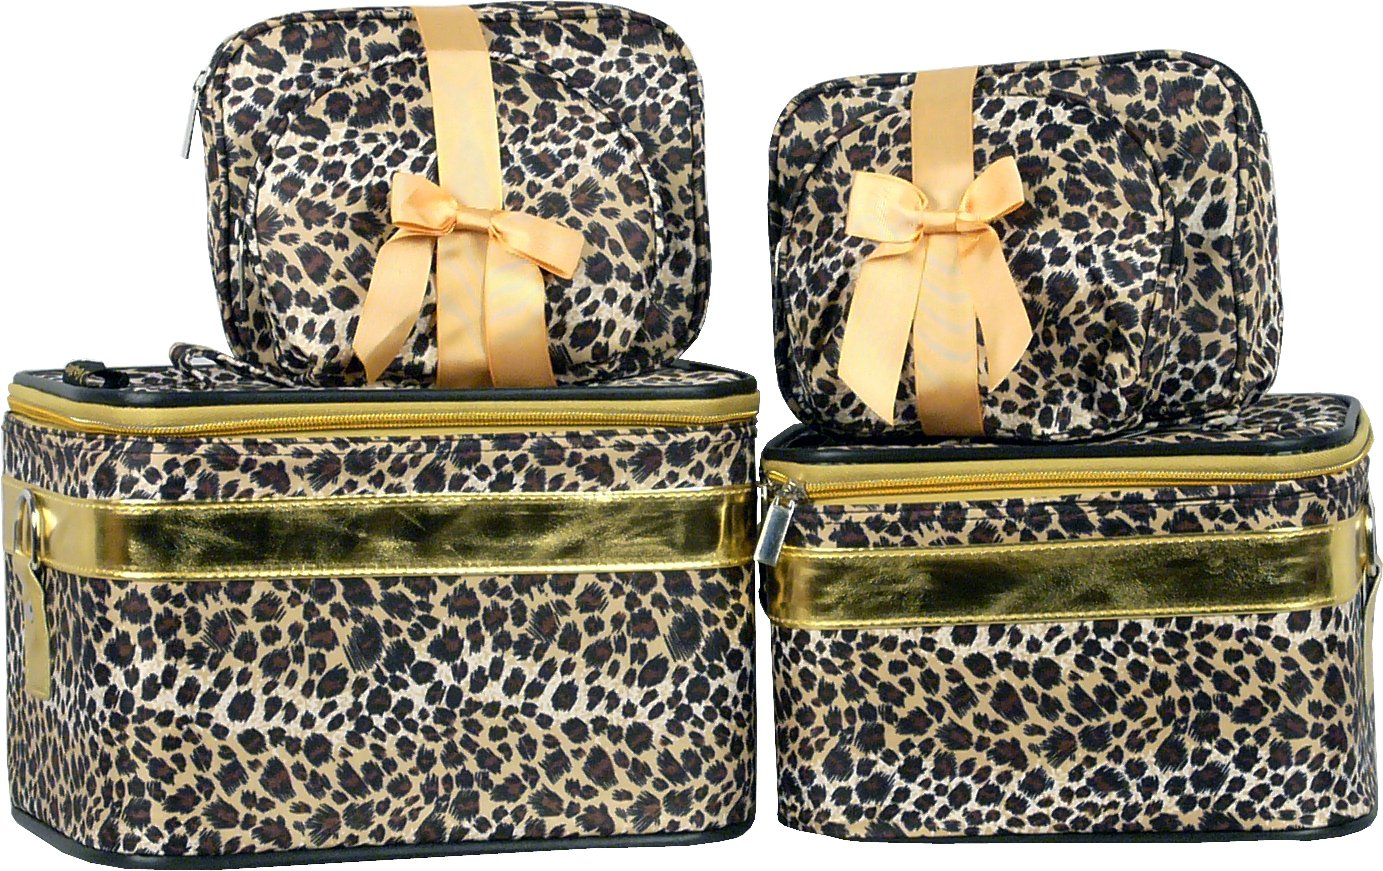 Leopard Cosmetic Case - 6 Pc Set